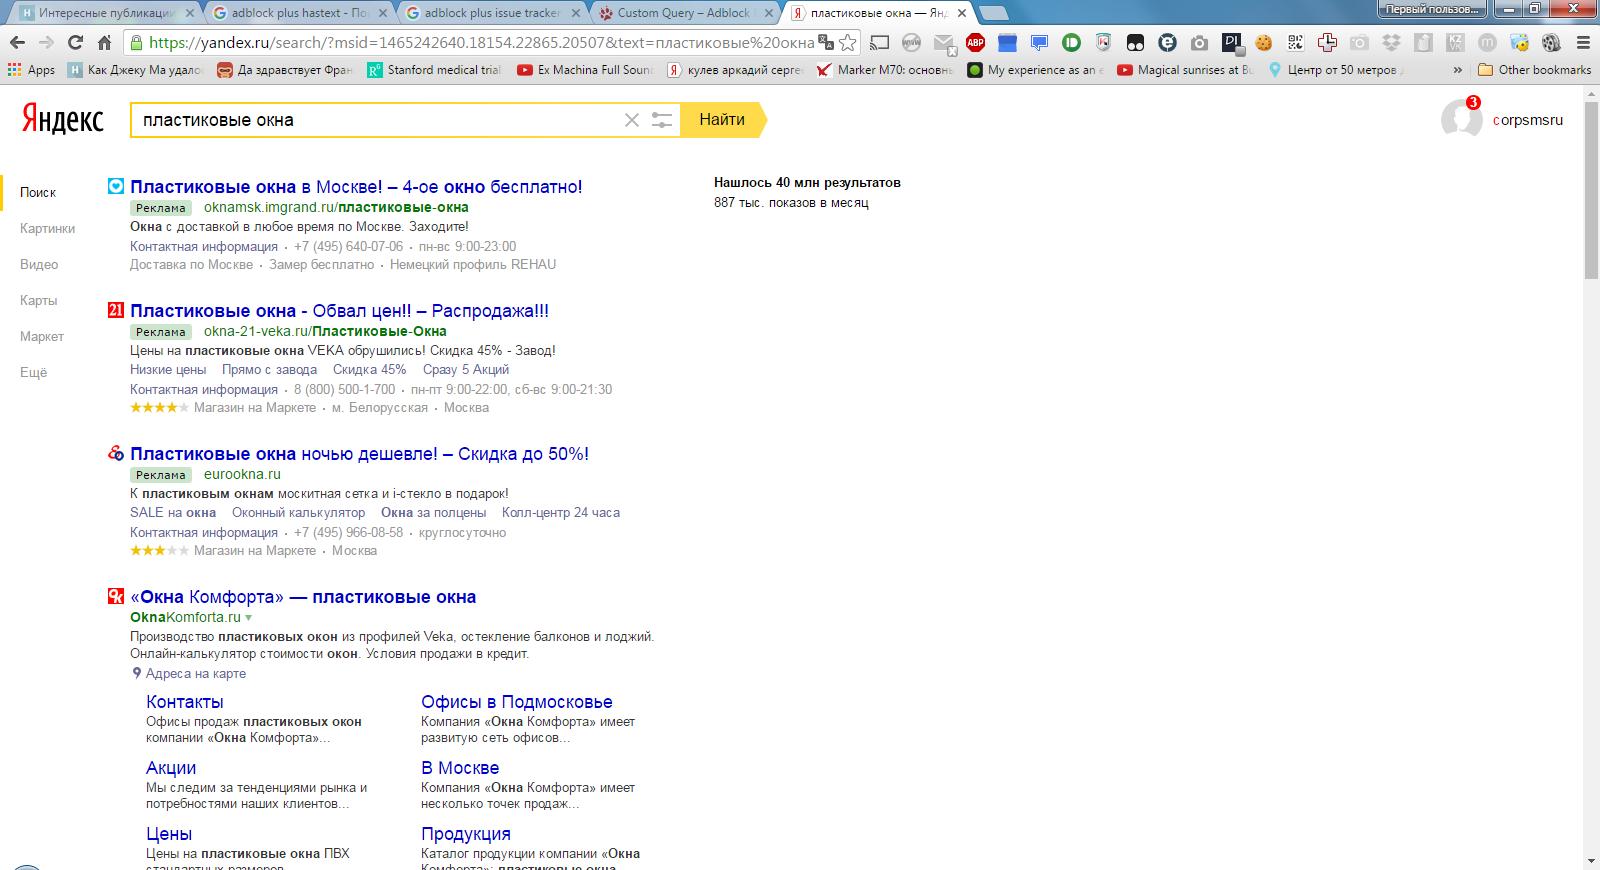 4118 (Yandex (biggest search engine in russia) ads still not